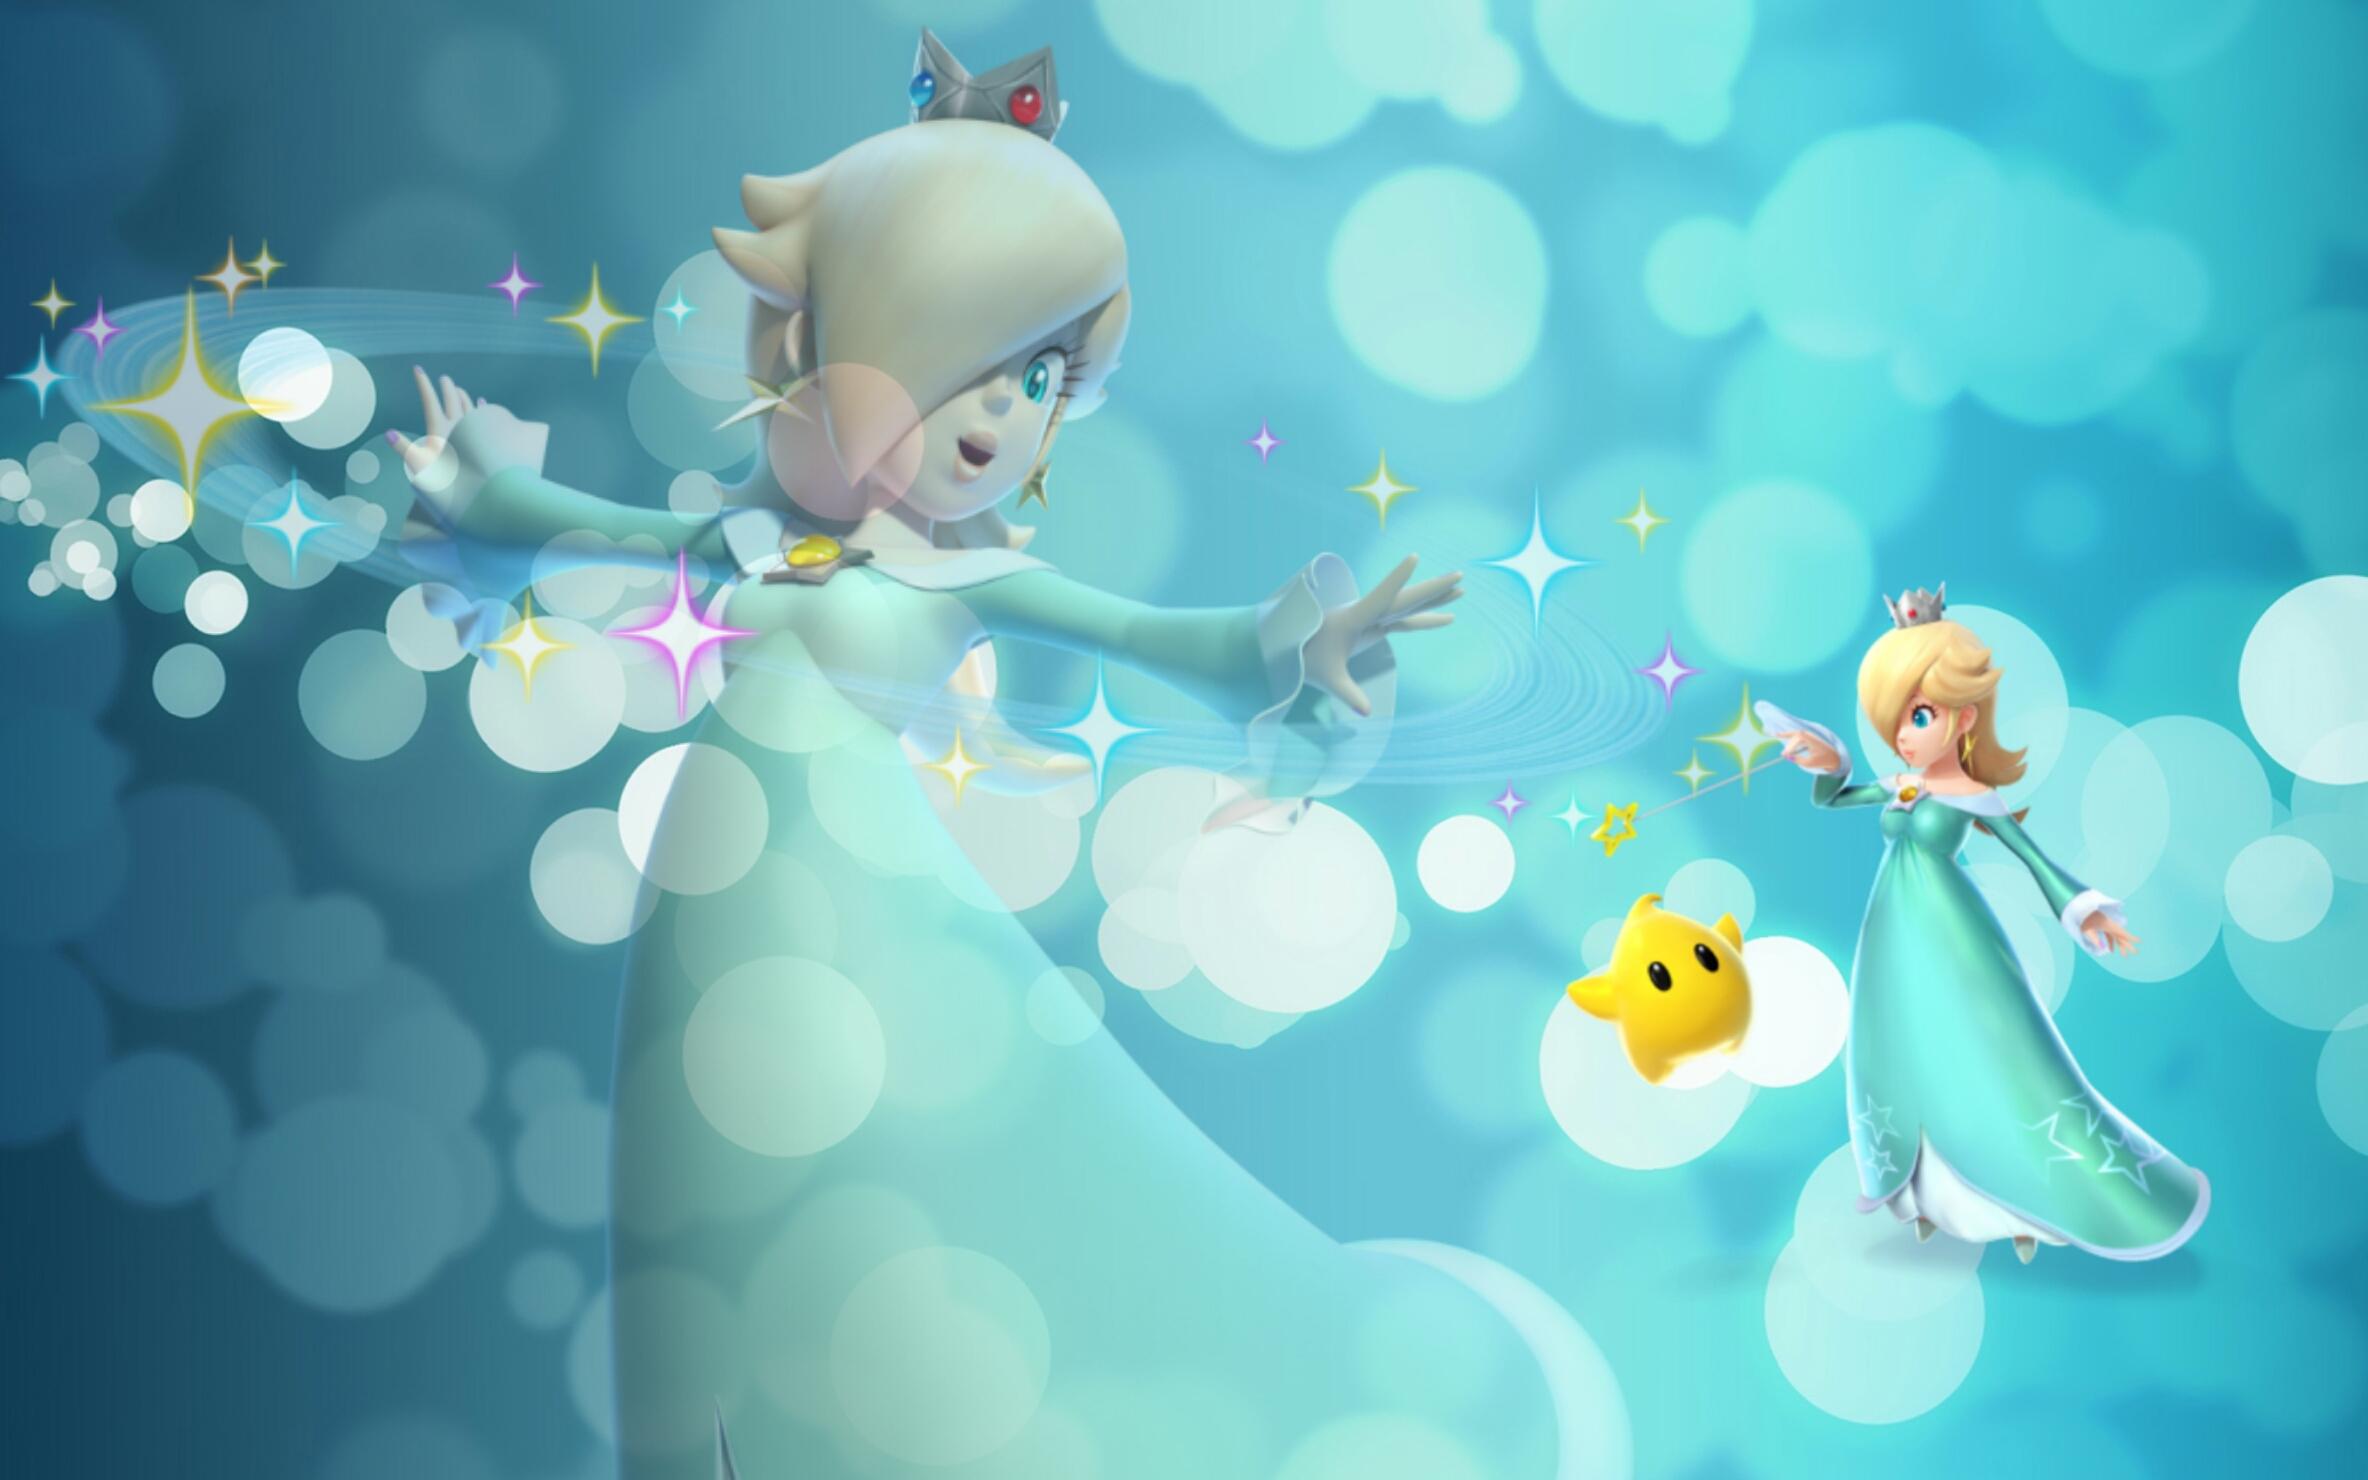 Princess Rosalina Wallpaper By Queen Zelda On Deviantart